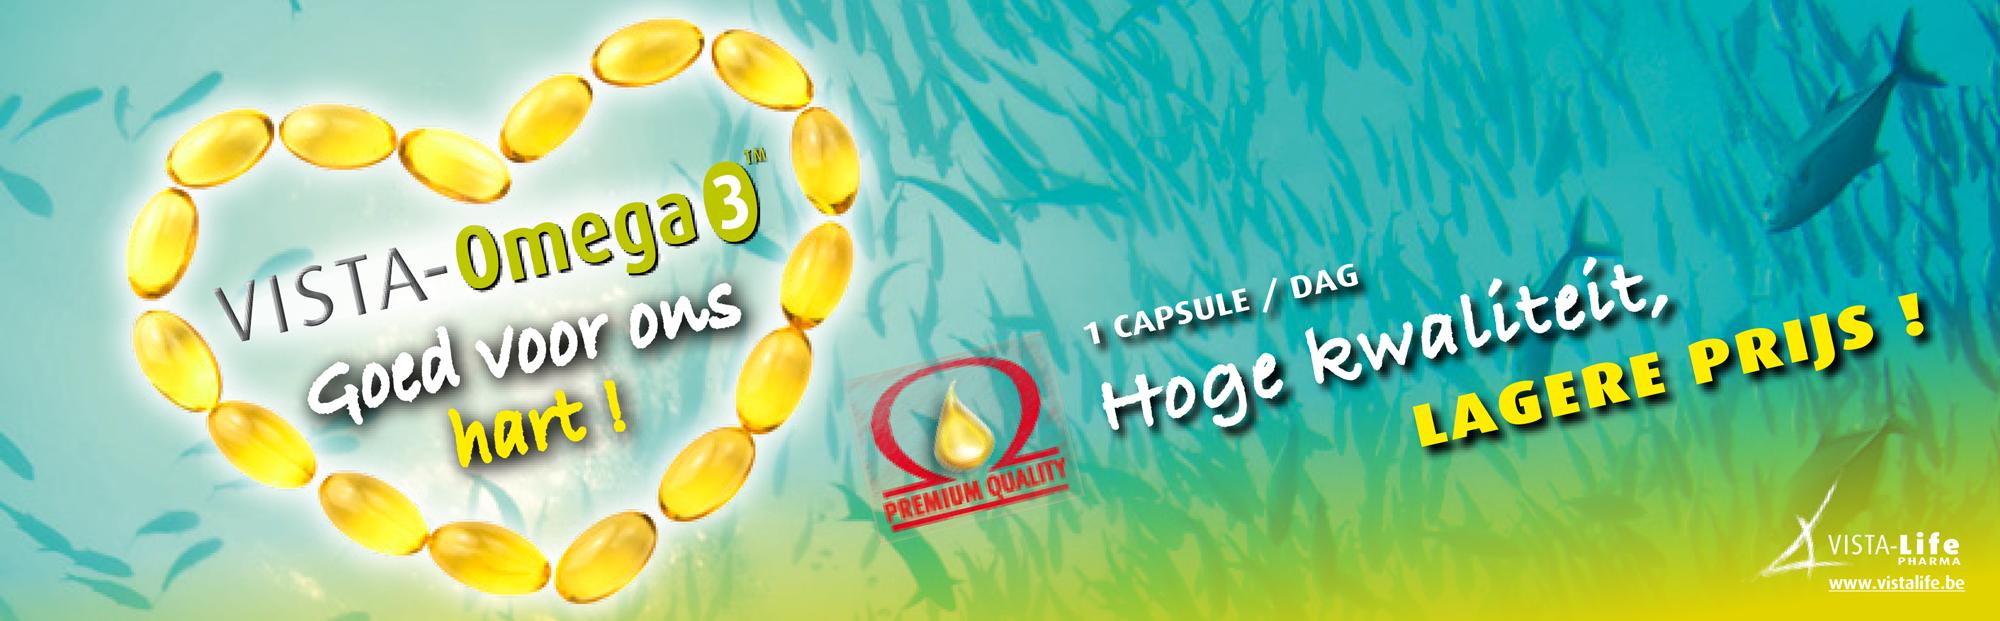 Vista-omega3-(topbanner)-nl